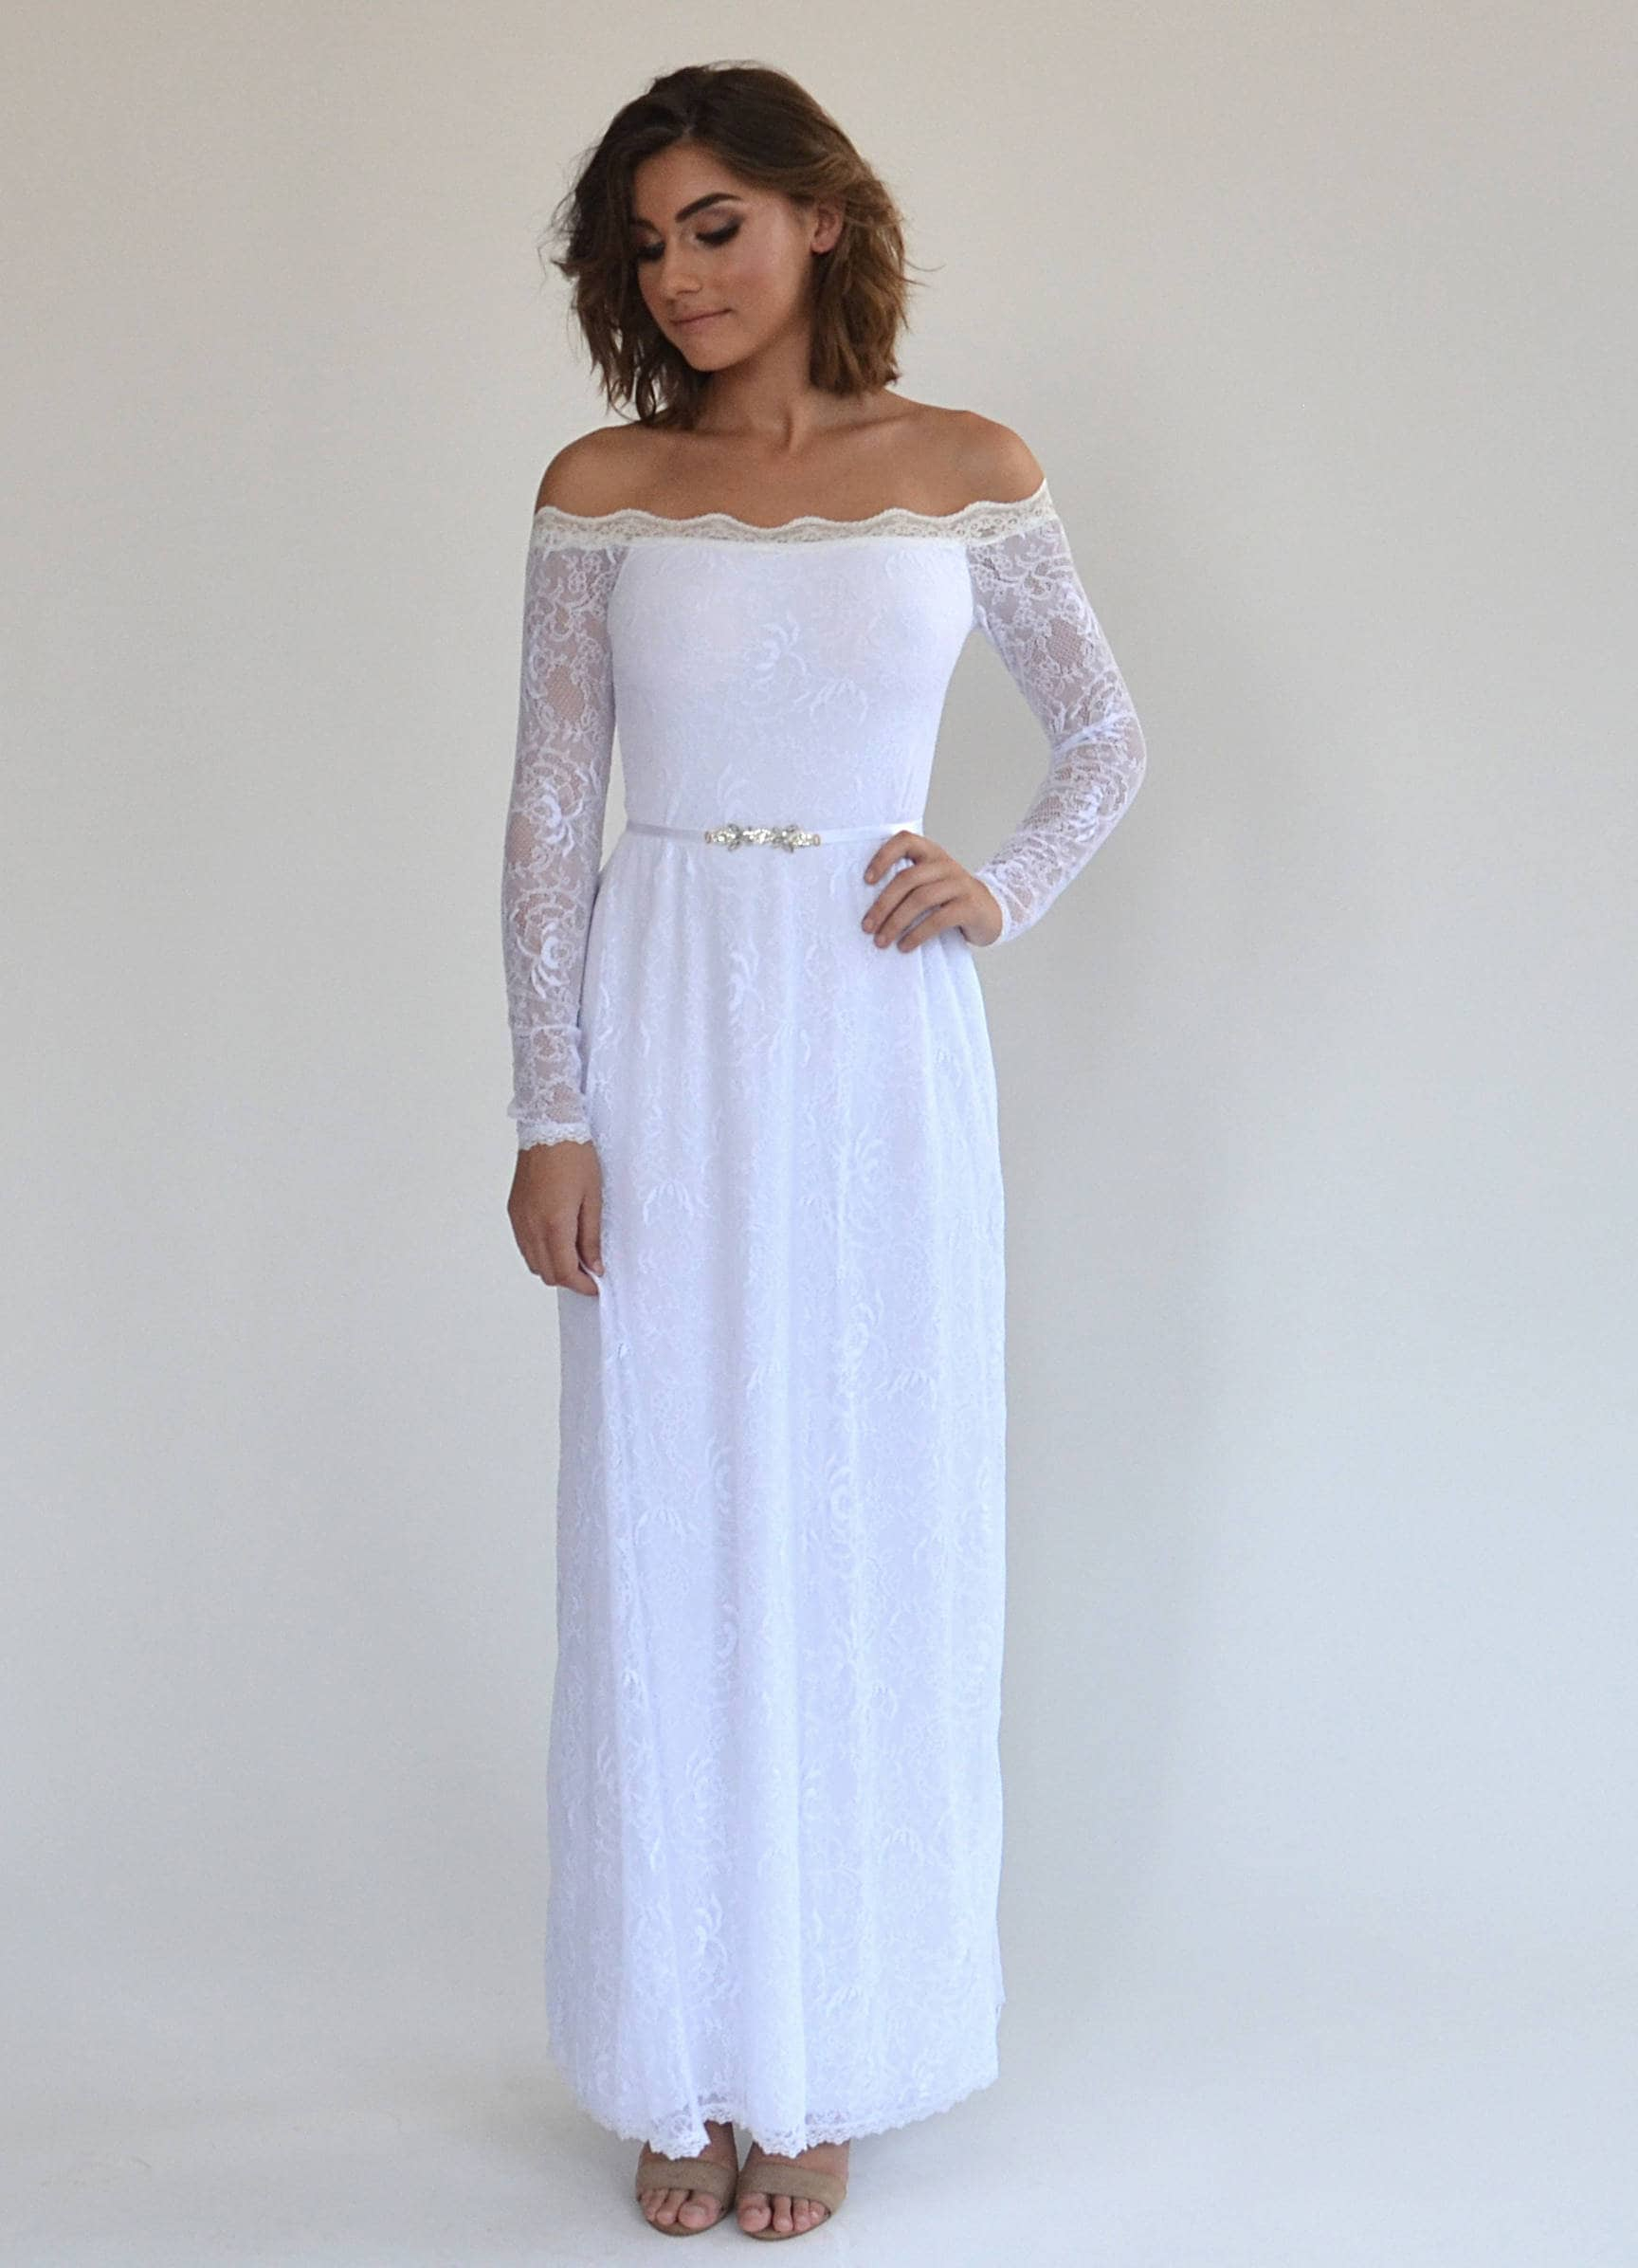 2cac67a7e One Shoulder Long Sleeve Lace Wedding Dress – DACC